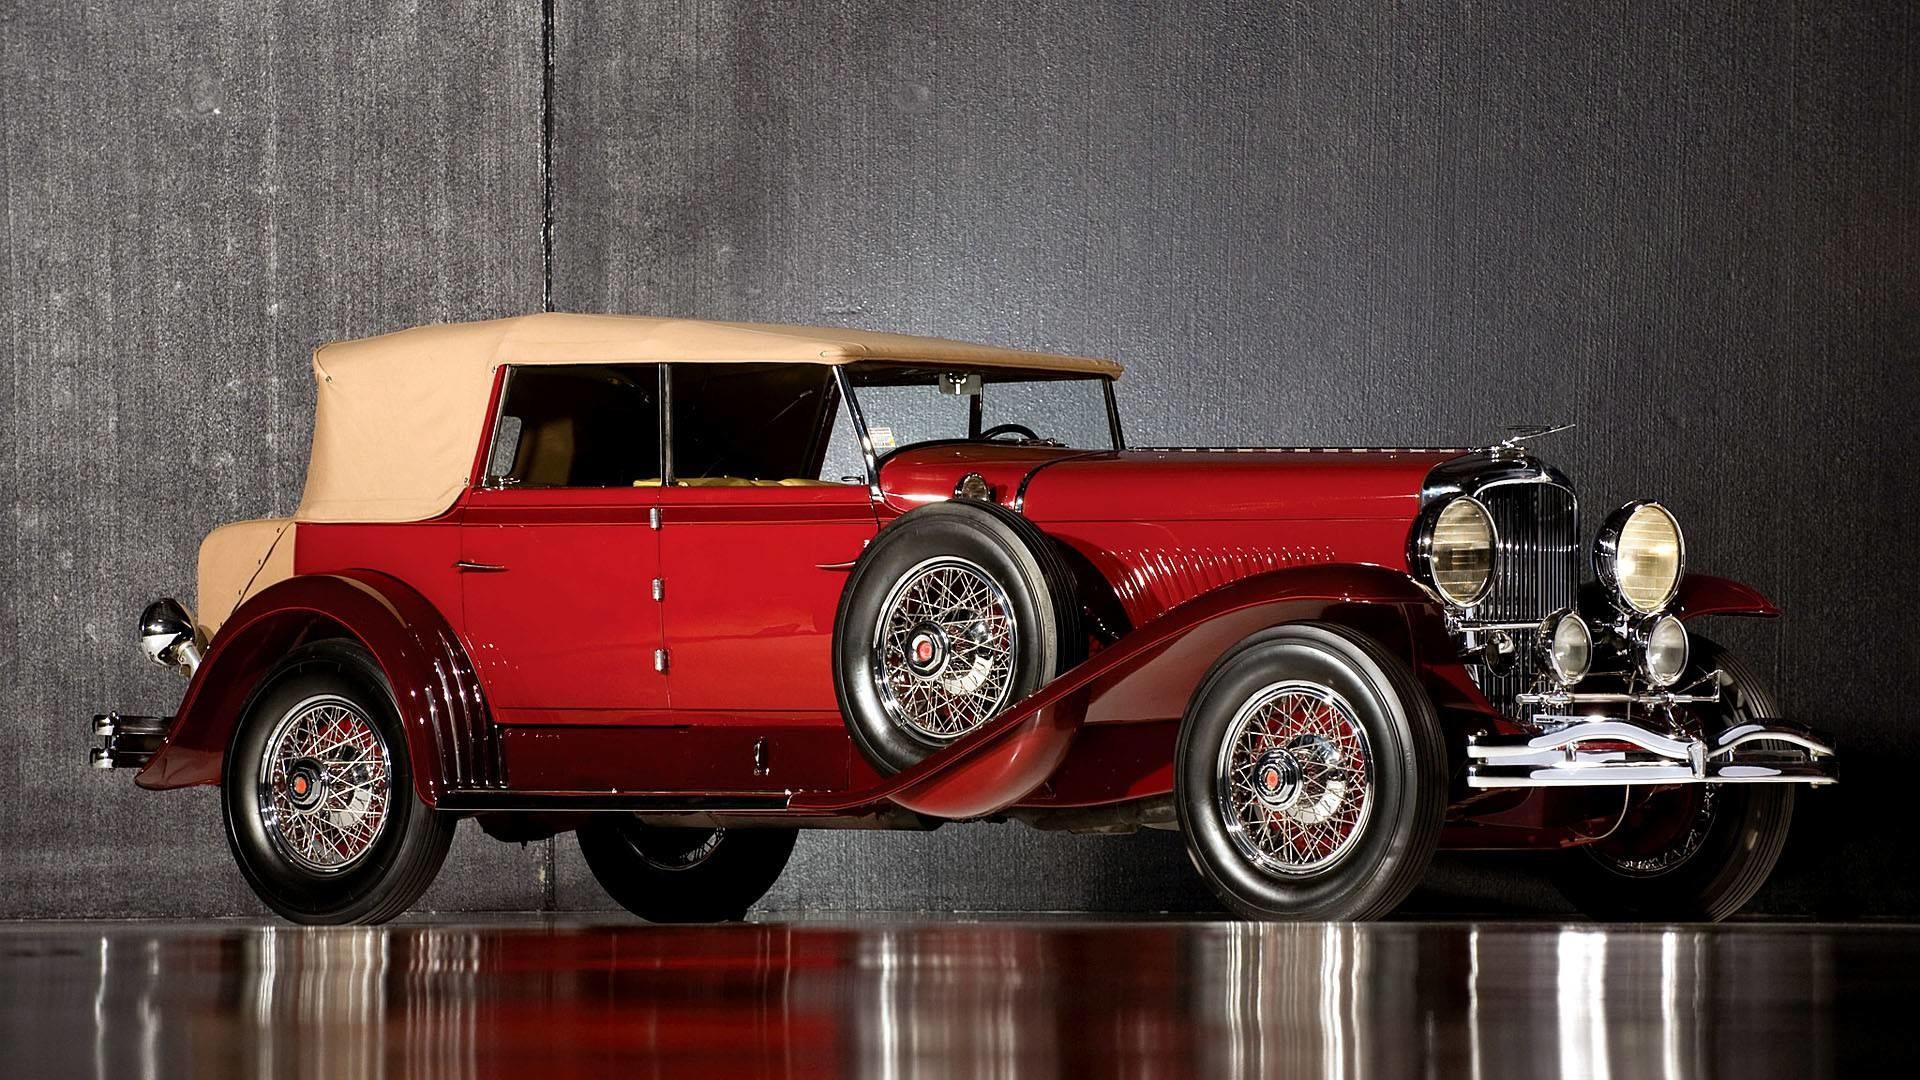 Res: 1920x1080, Old Car Vintage Wallpaper | Vintage Car Images | New Wallpapers